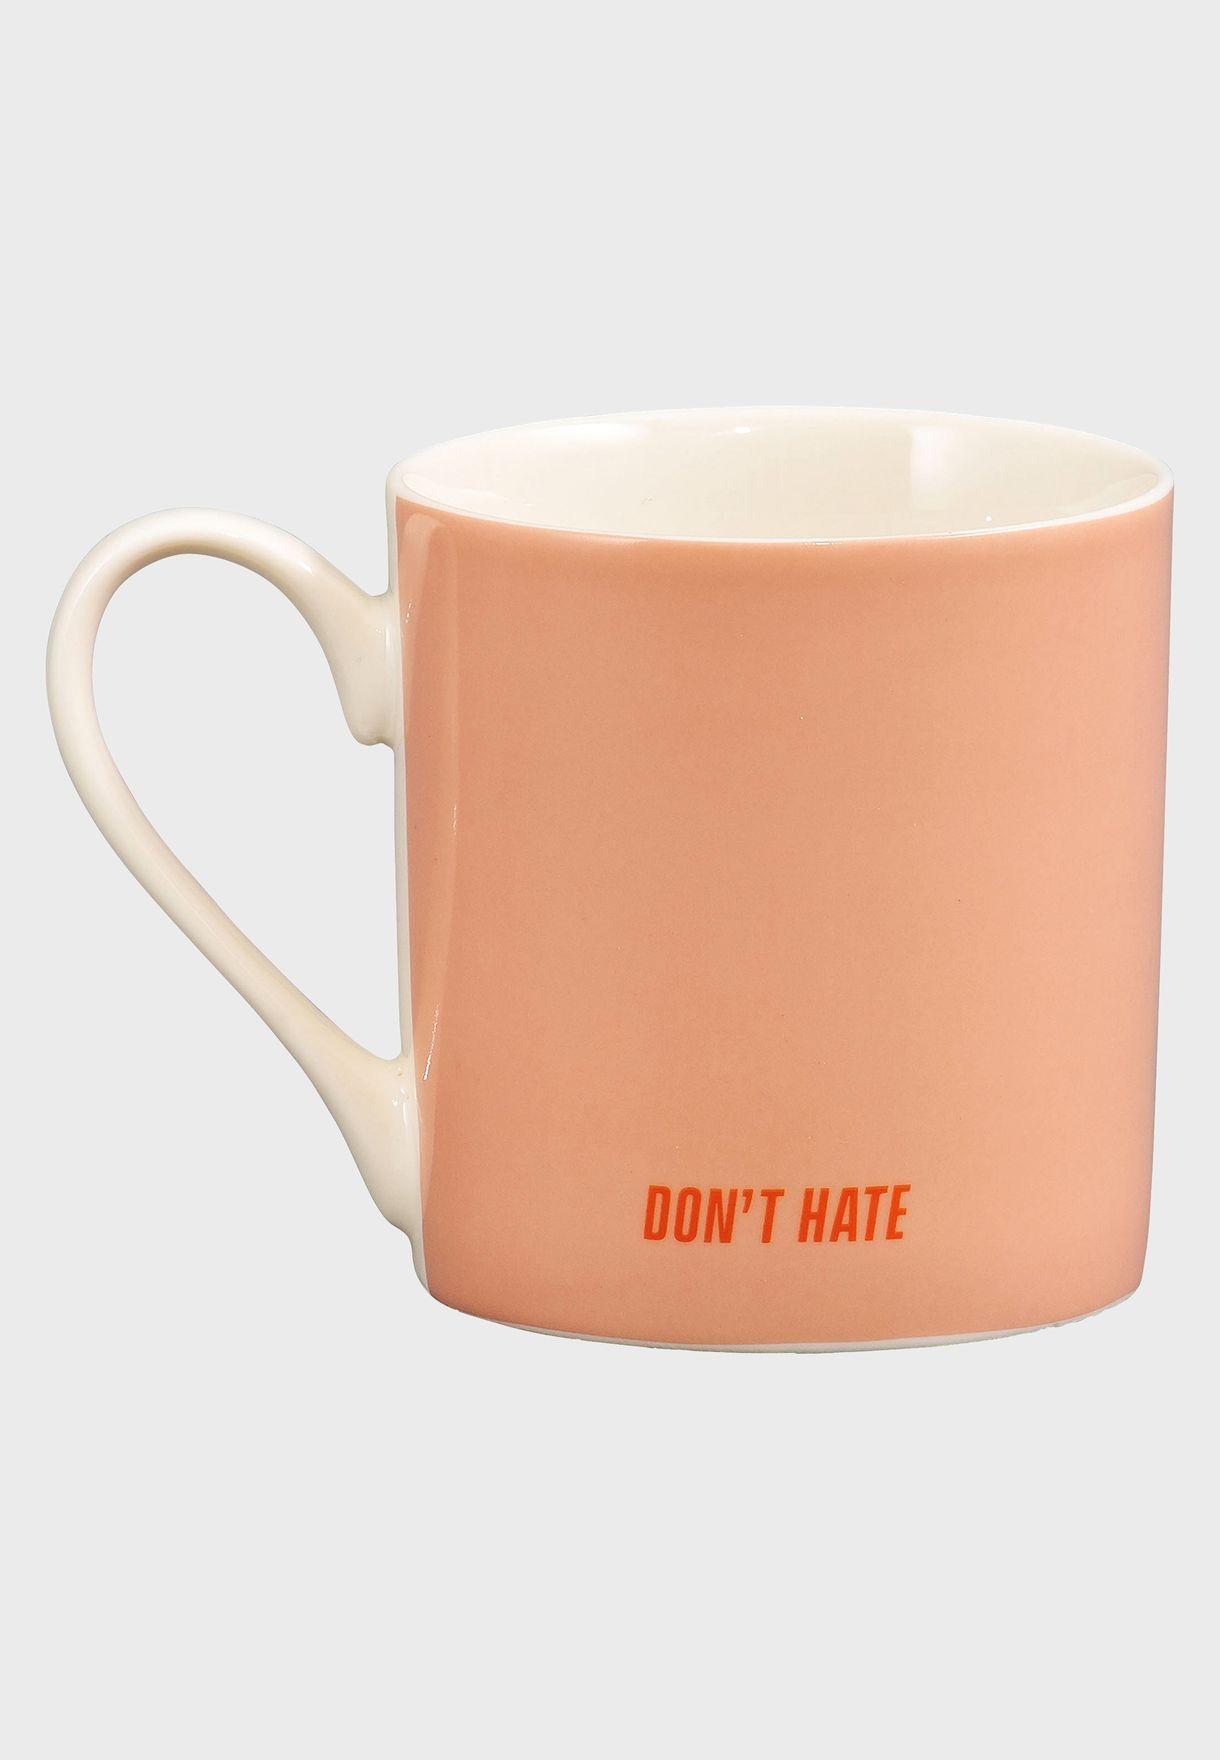 Femme And Fierce Mug